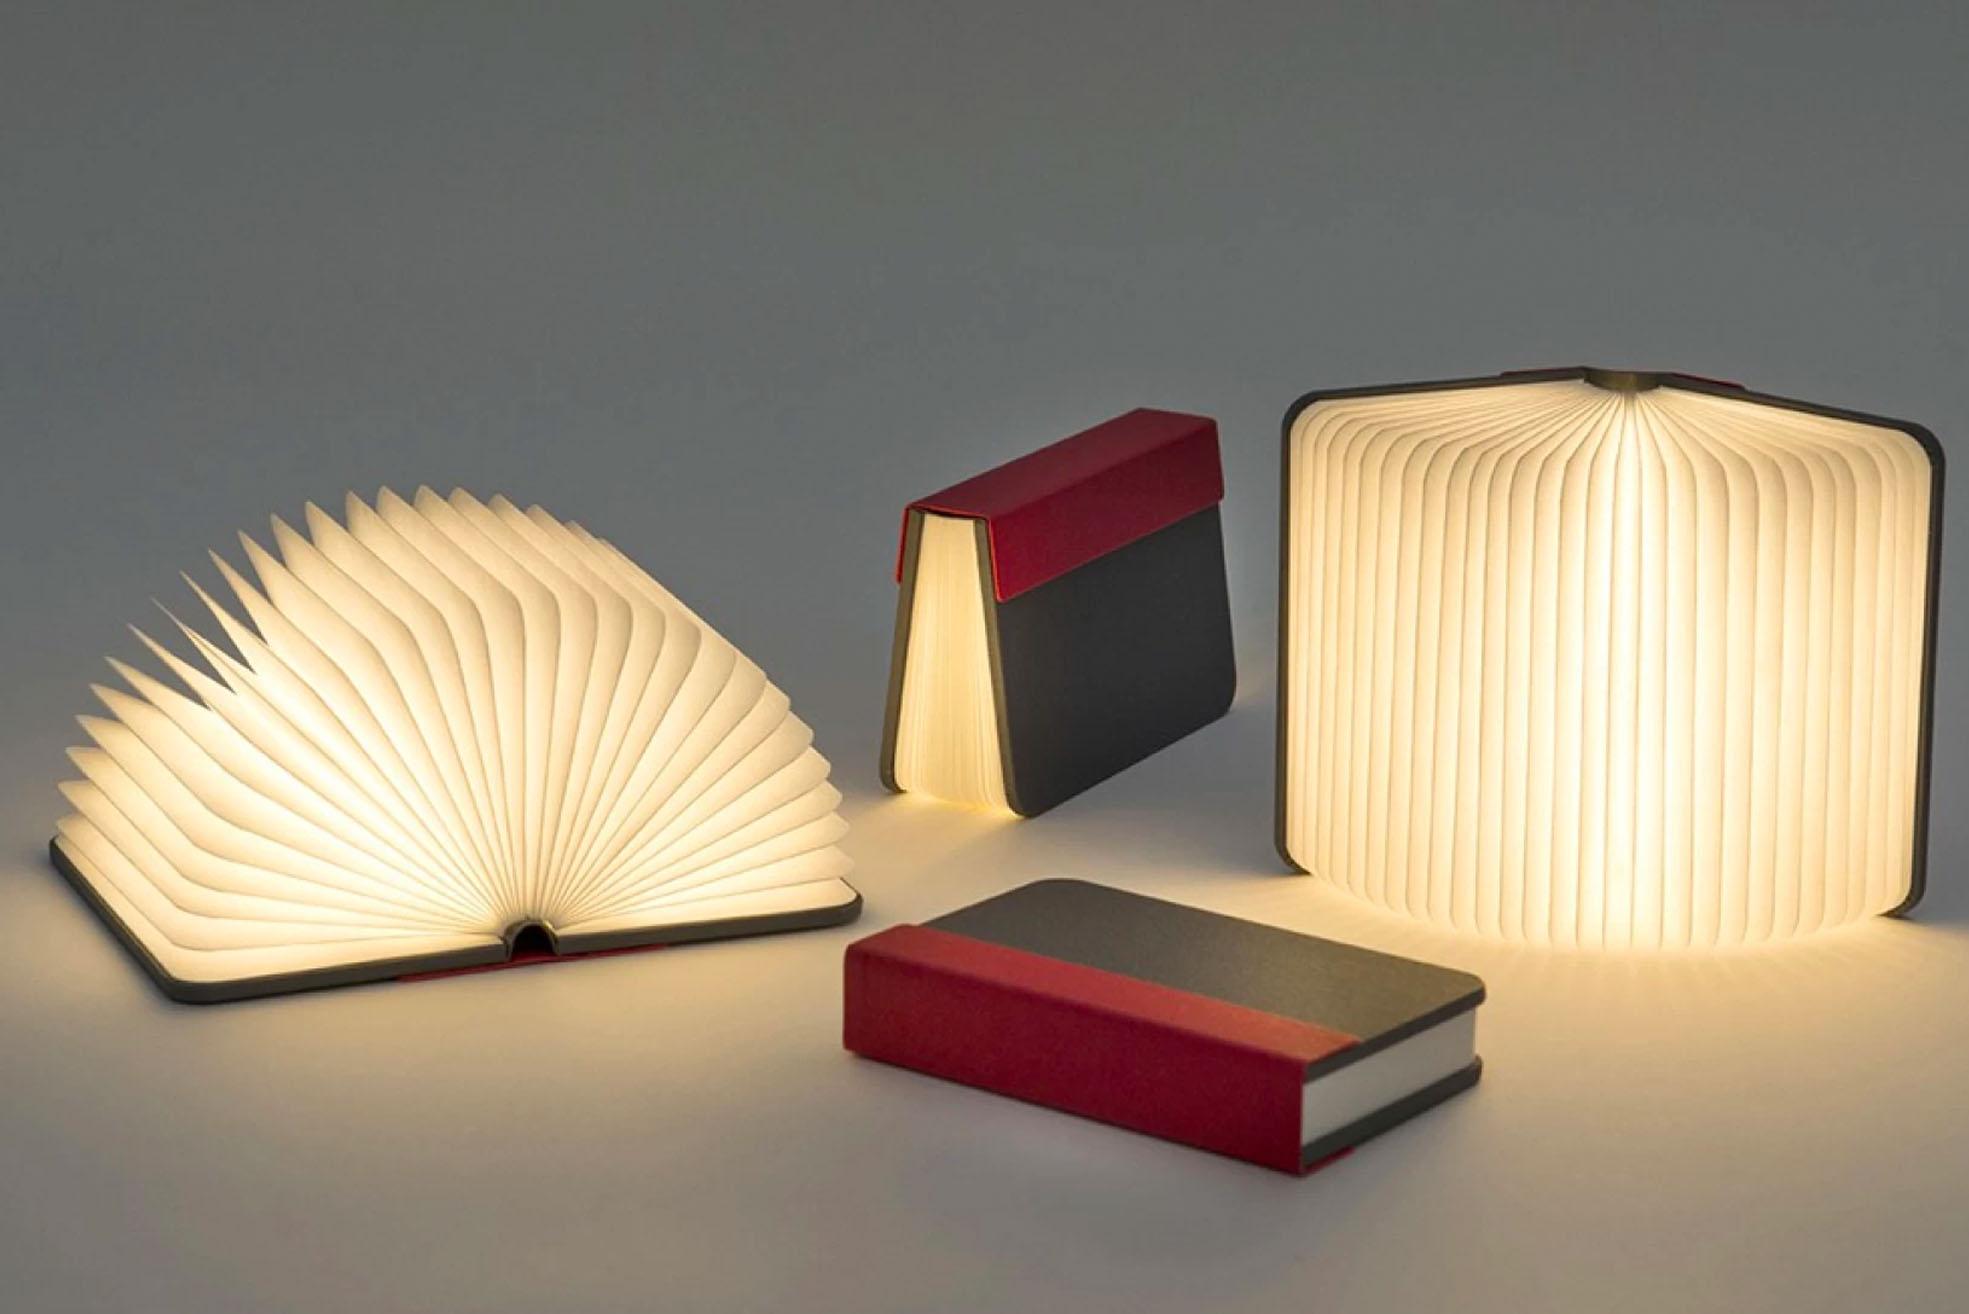 Mini Lumio+ lamp by Max Gunawan